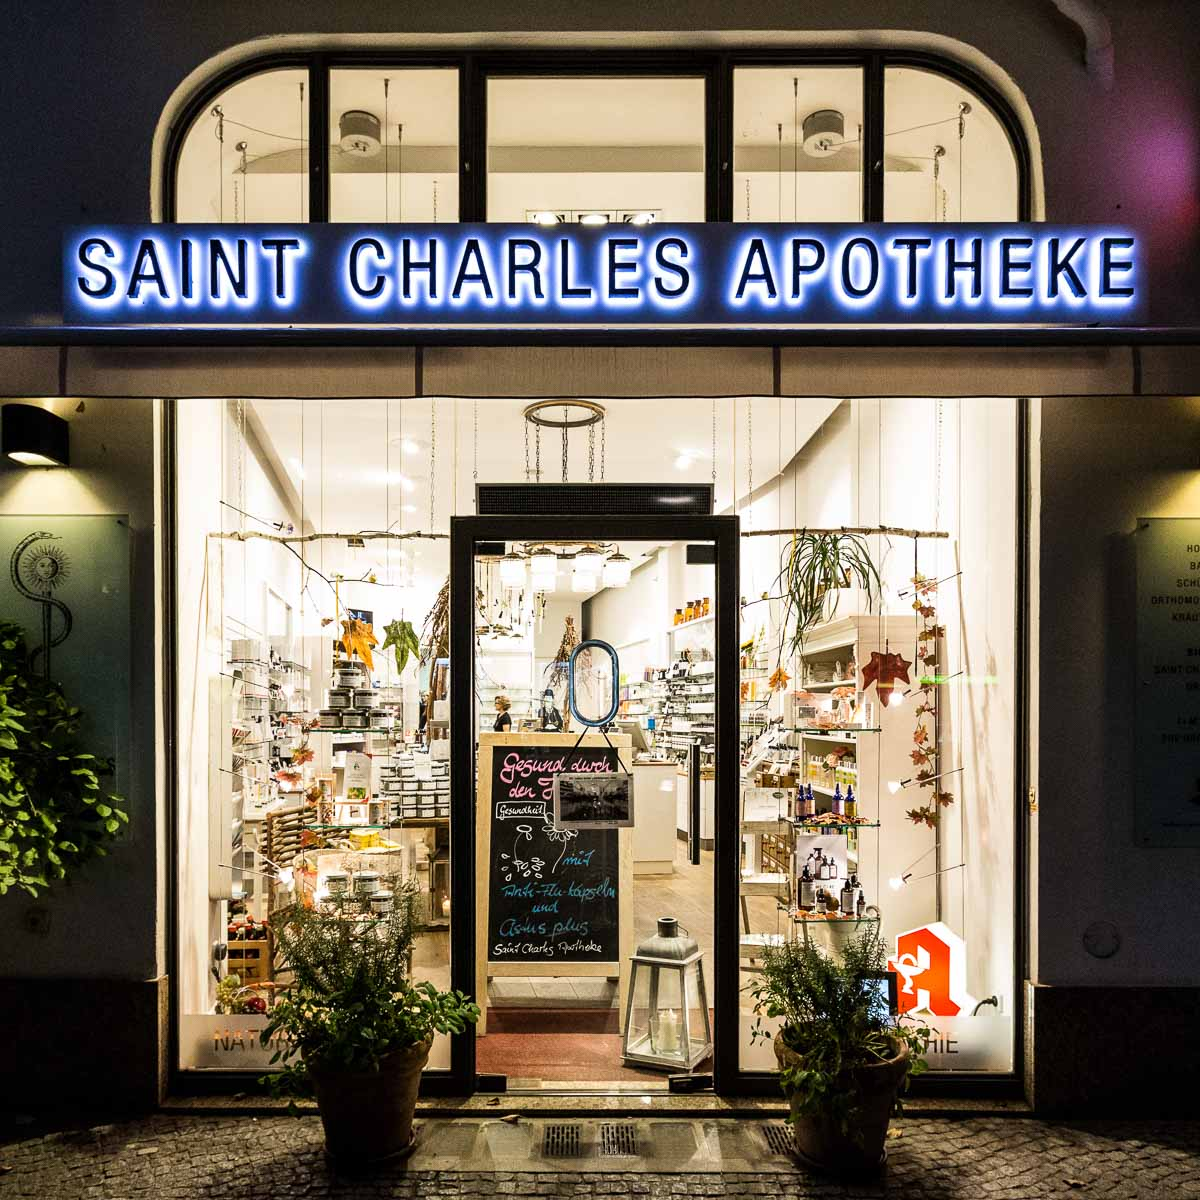 Saint Charles Apotheke Berlin Wilmersdorf 1-2